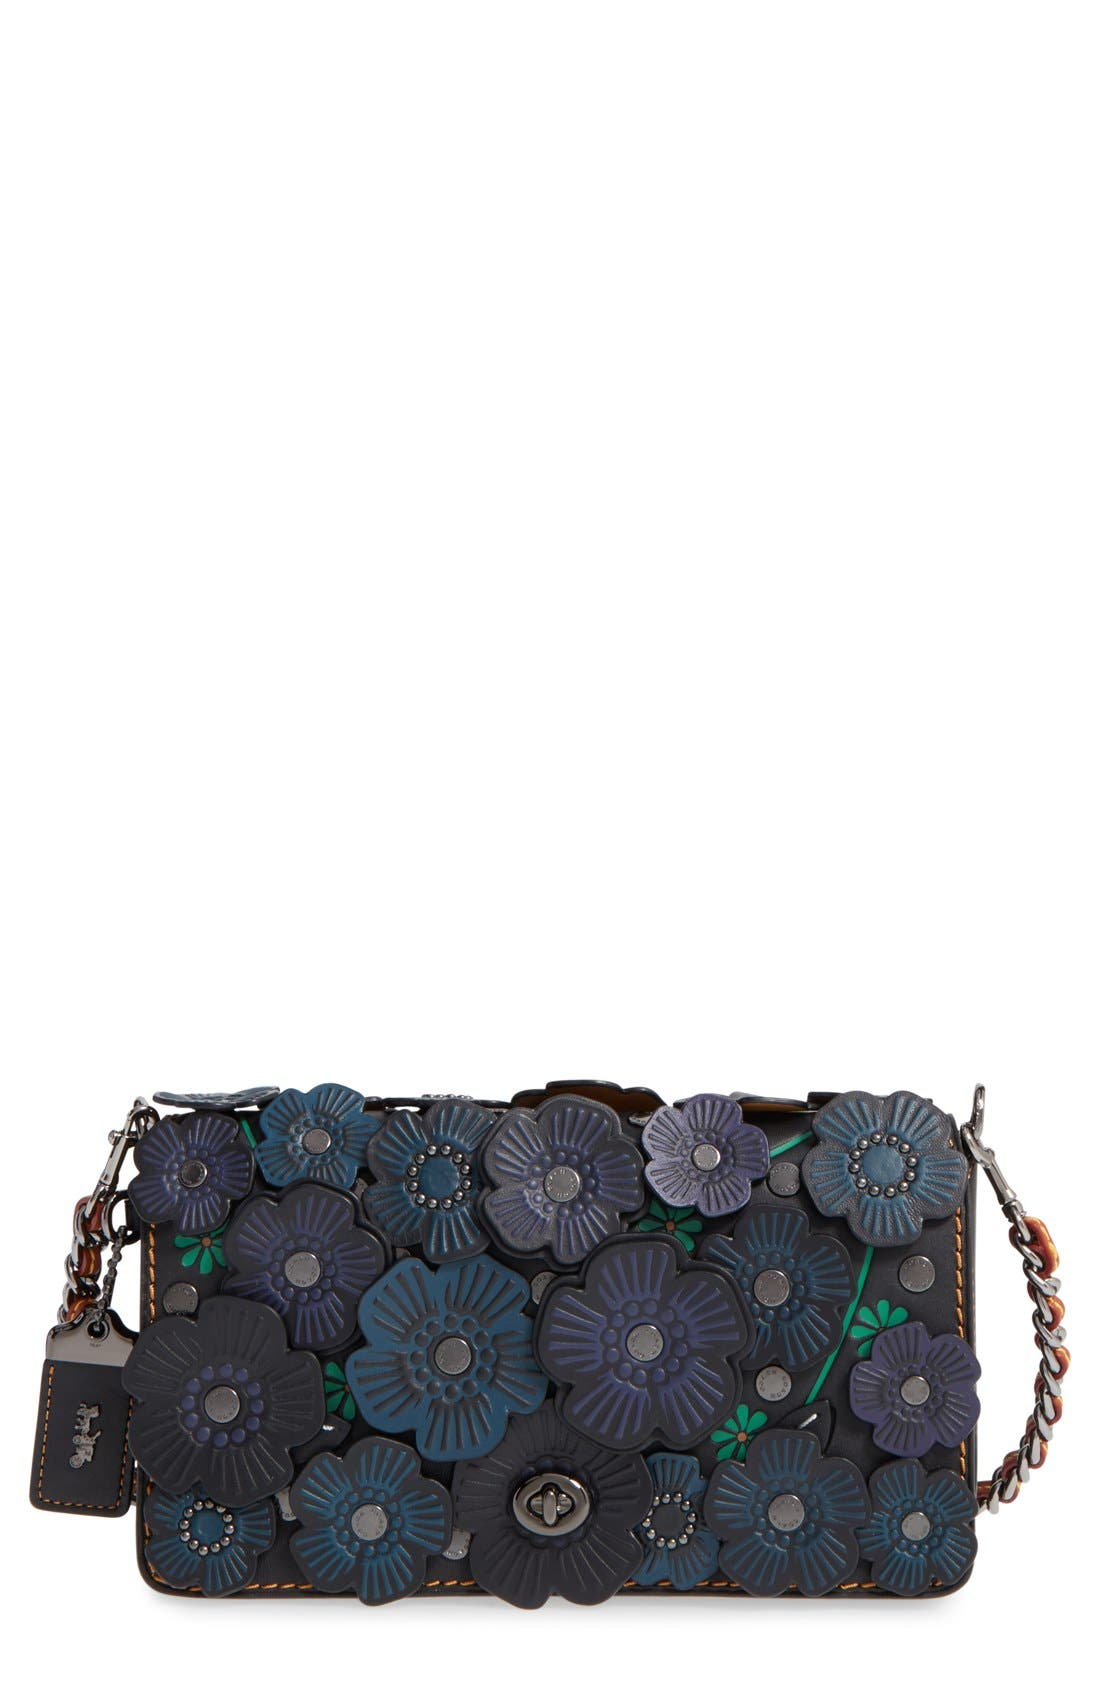 'Dinky' Flower Appliqué Leather Crossbody Bag,                             Main thumbnail 8, color,